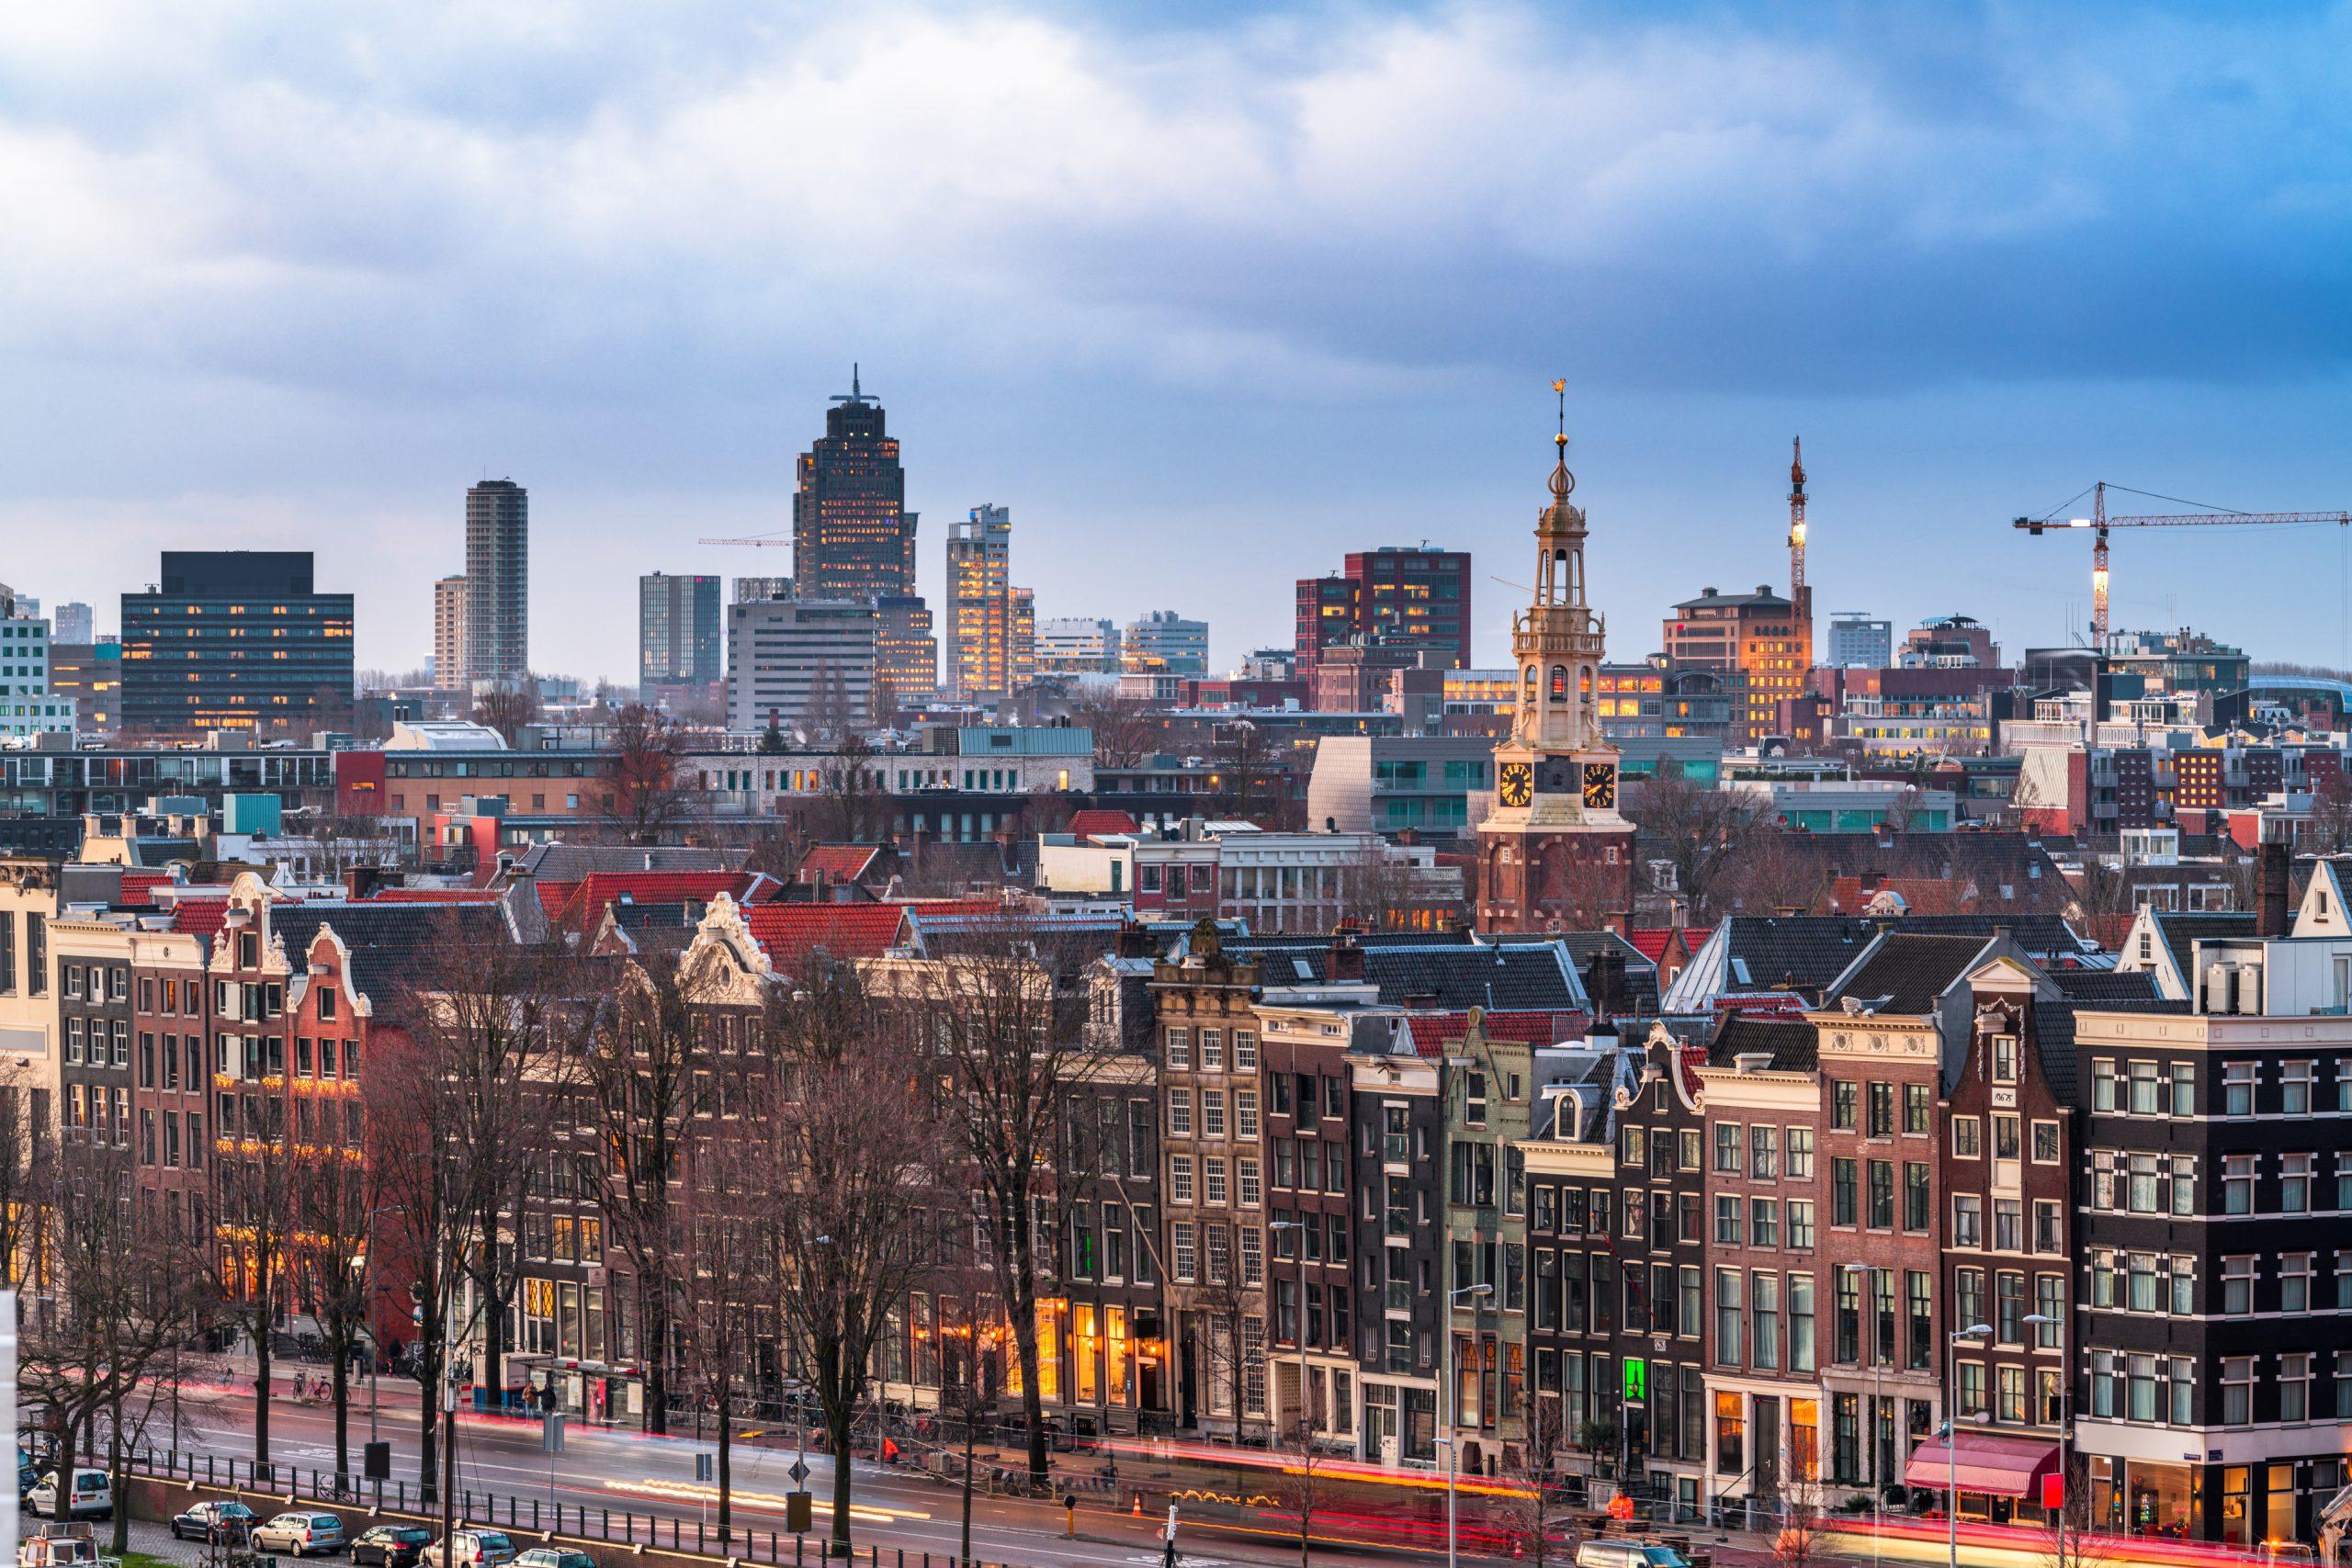 amsterdam location